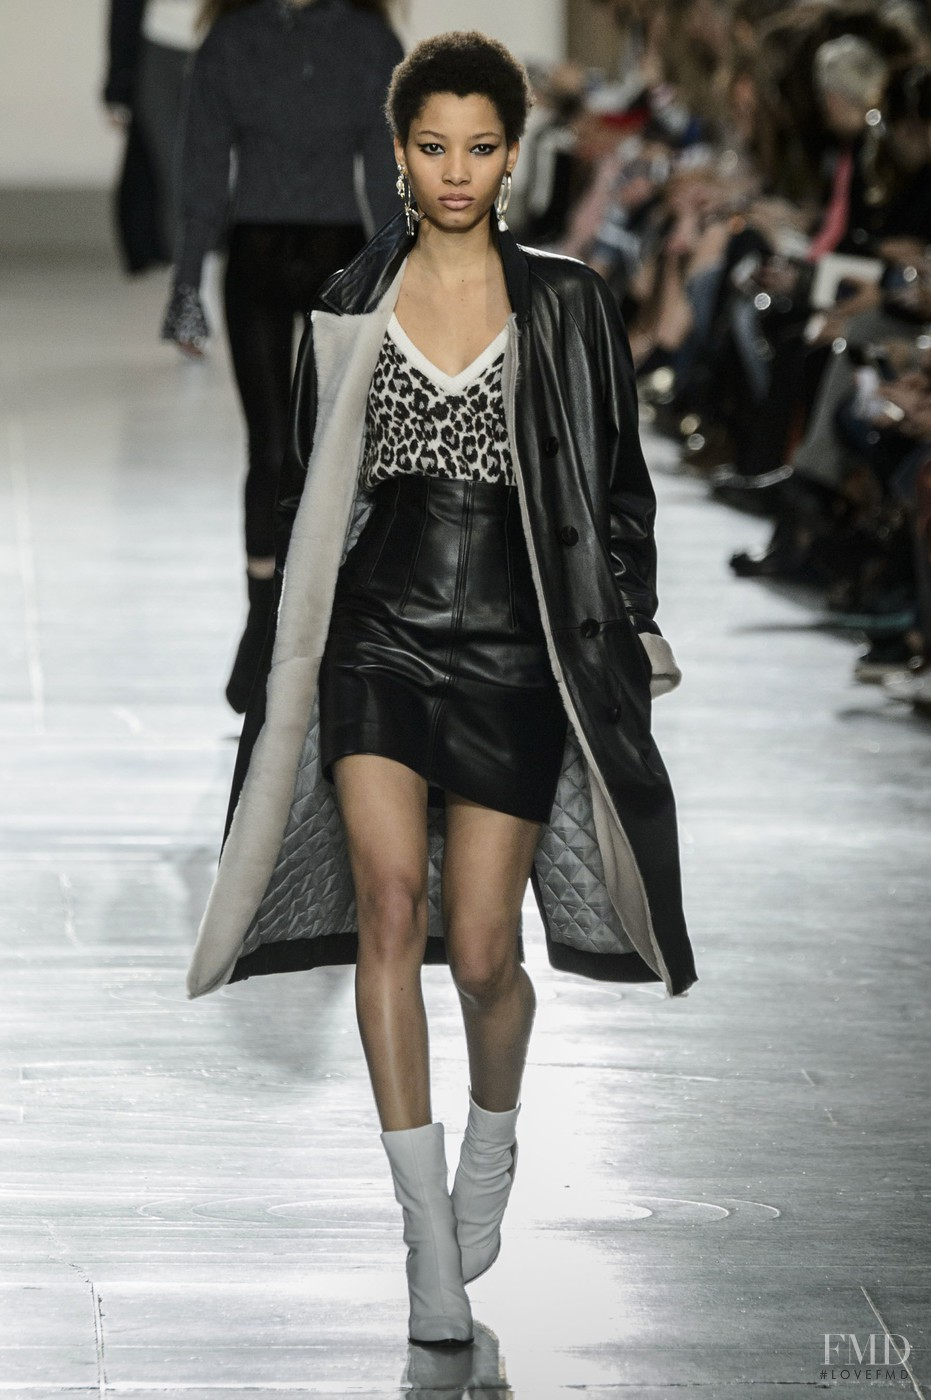 Topshop - Official Site London fashion week skinny models